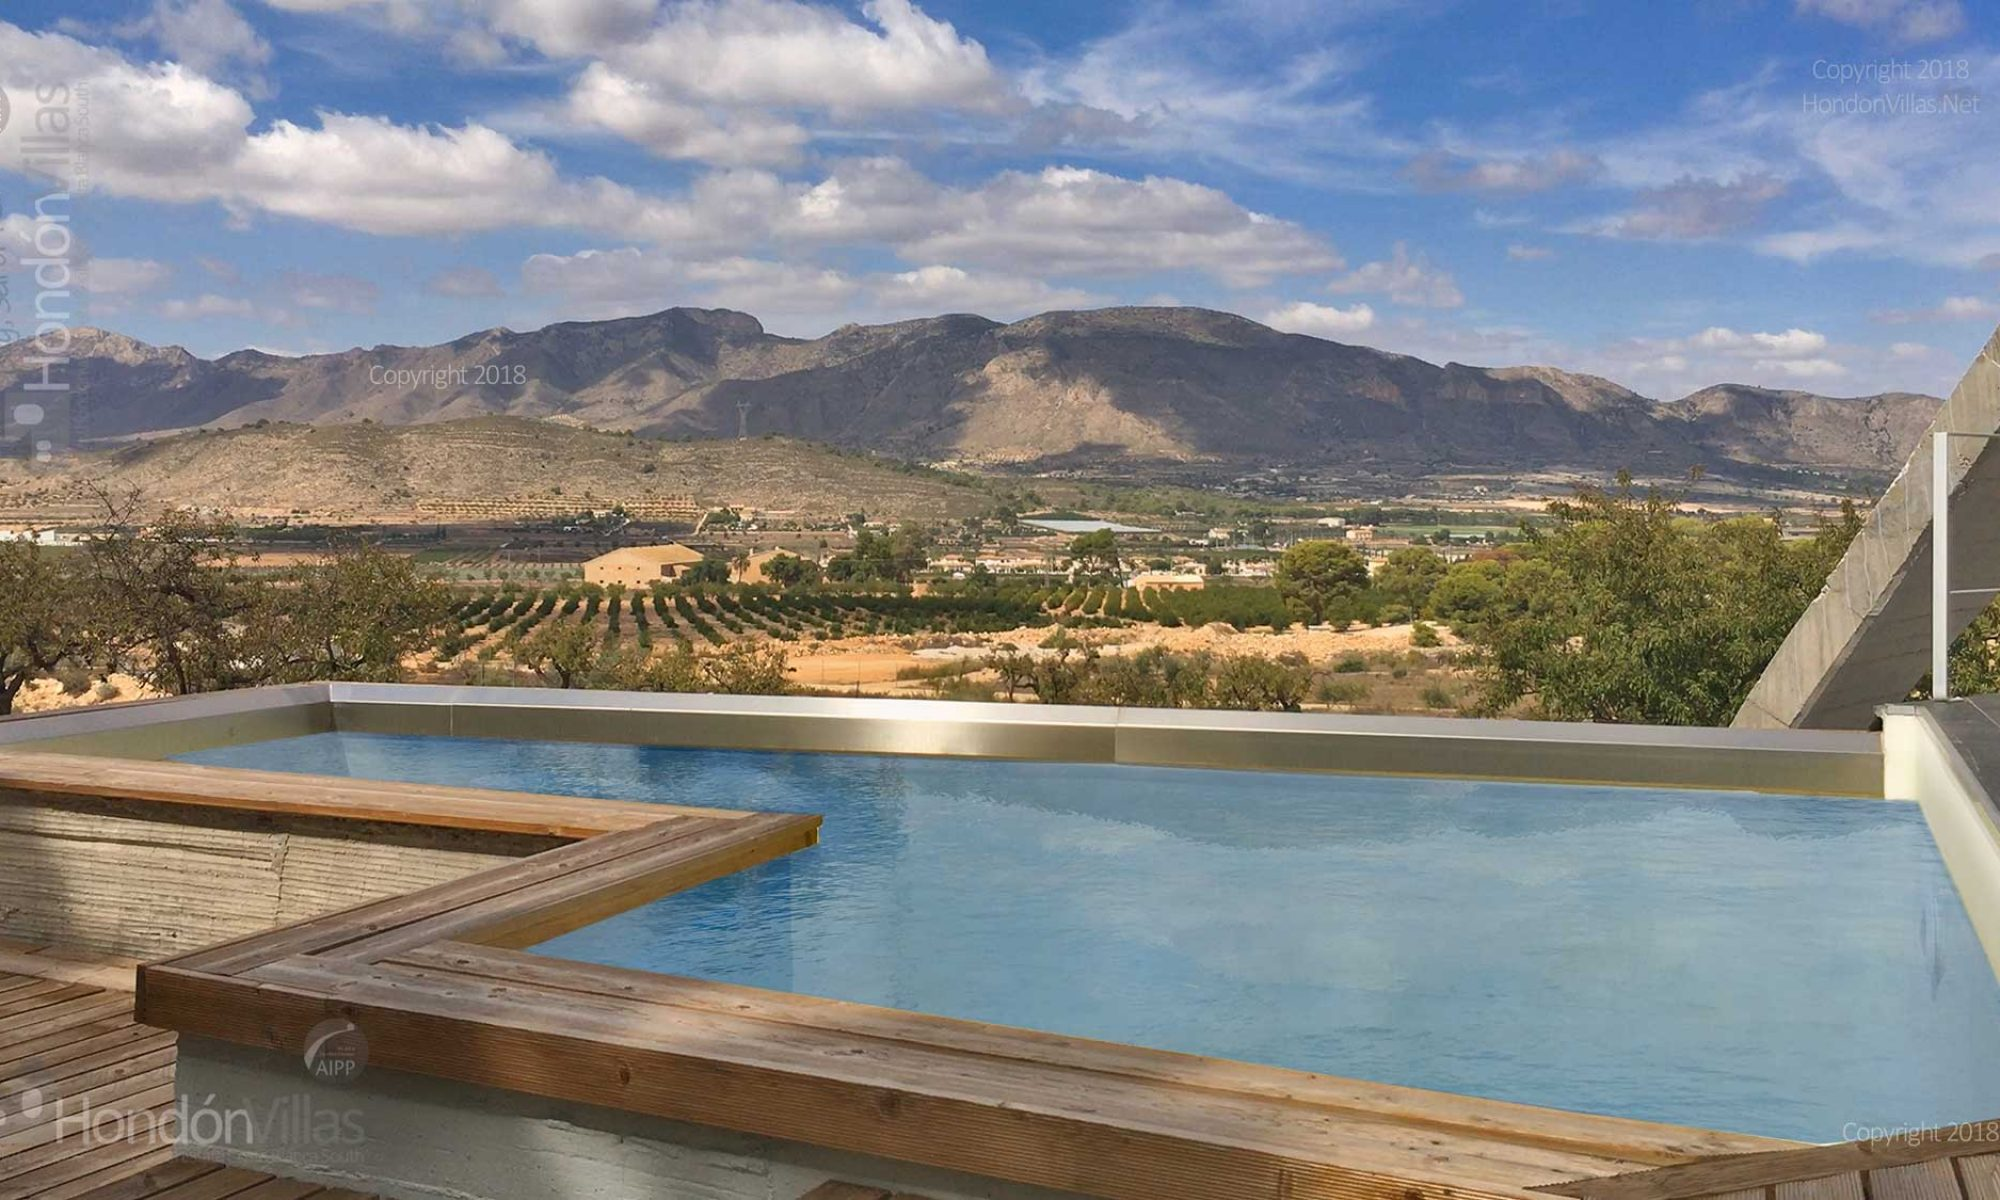 The Hondon Villas Blog